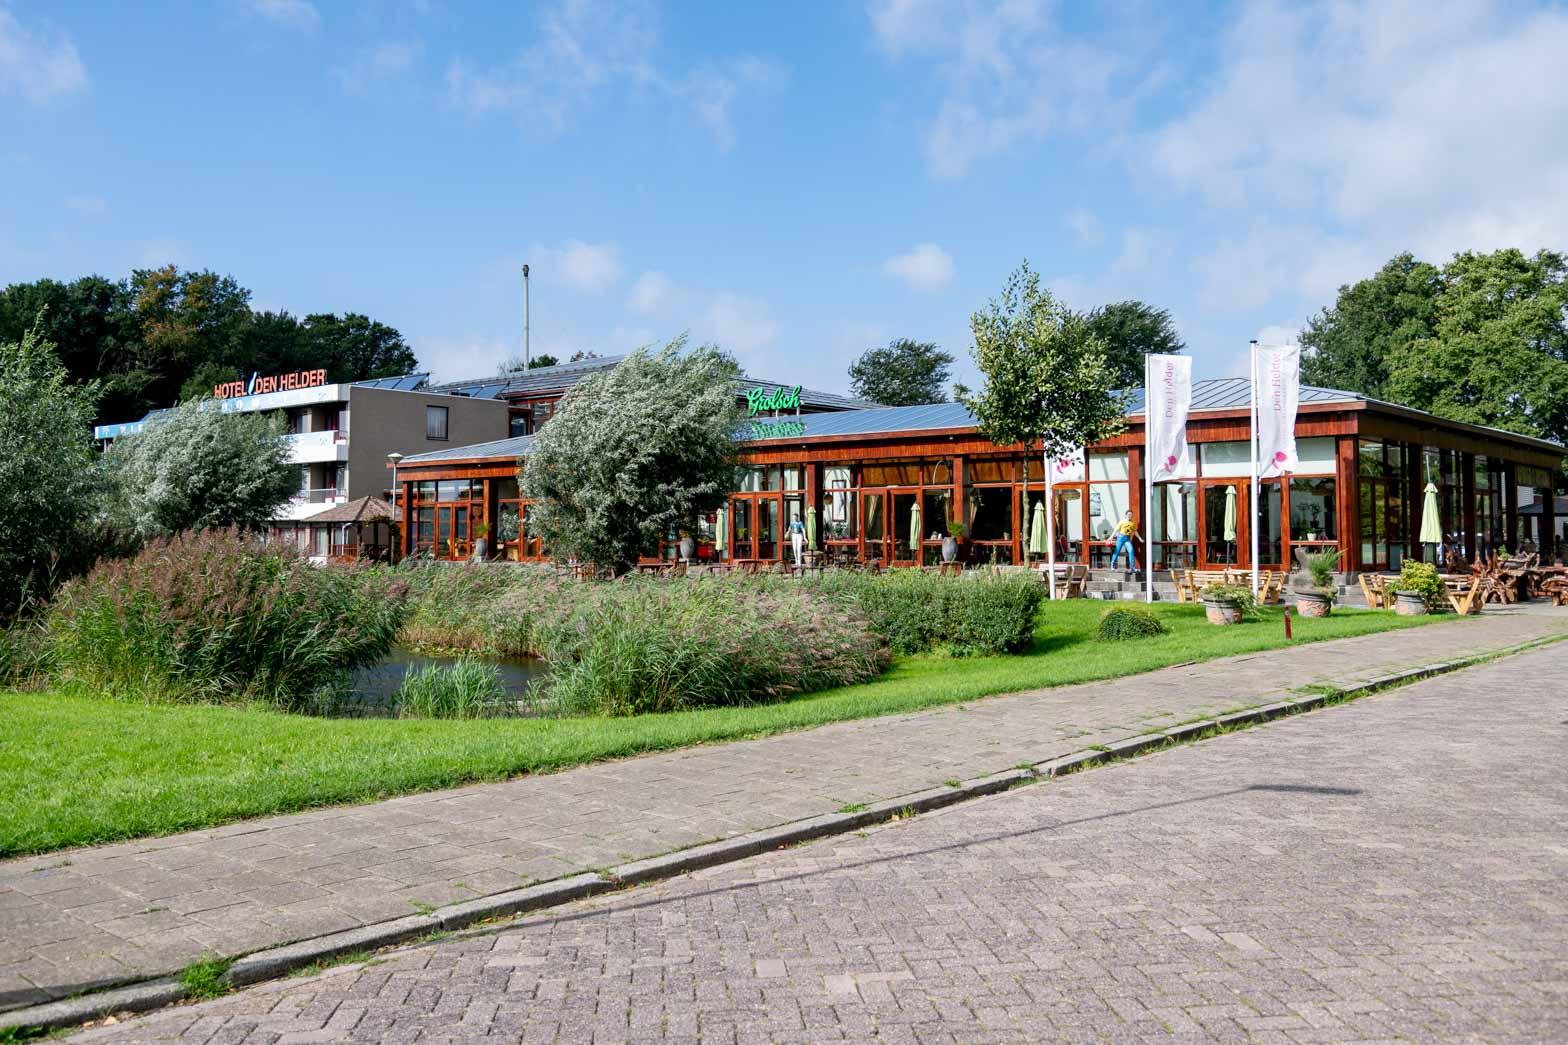 Basisschool De Fontein Den Helder.T Wad Archieven Esdege Reigersdaal